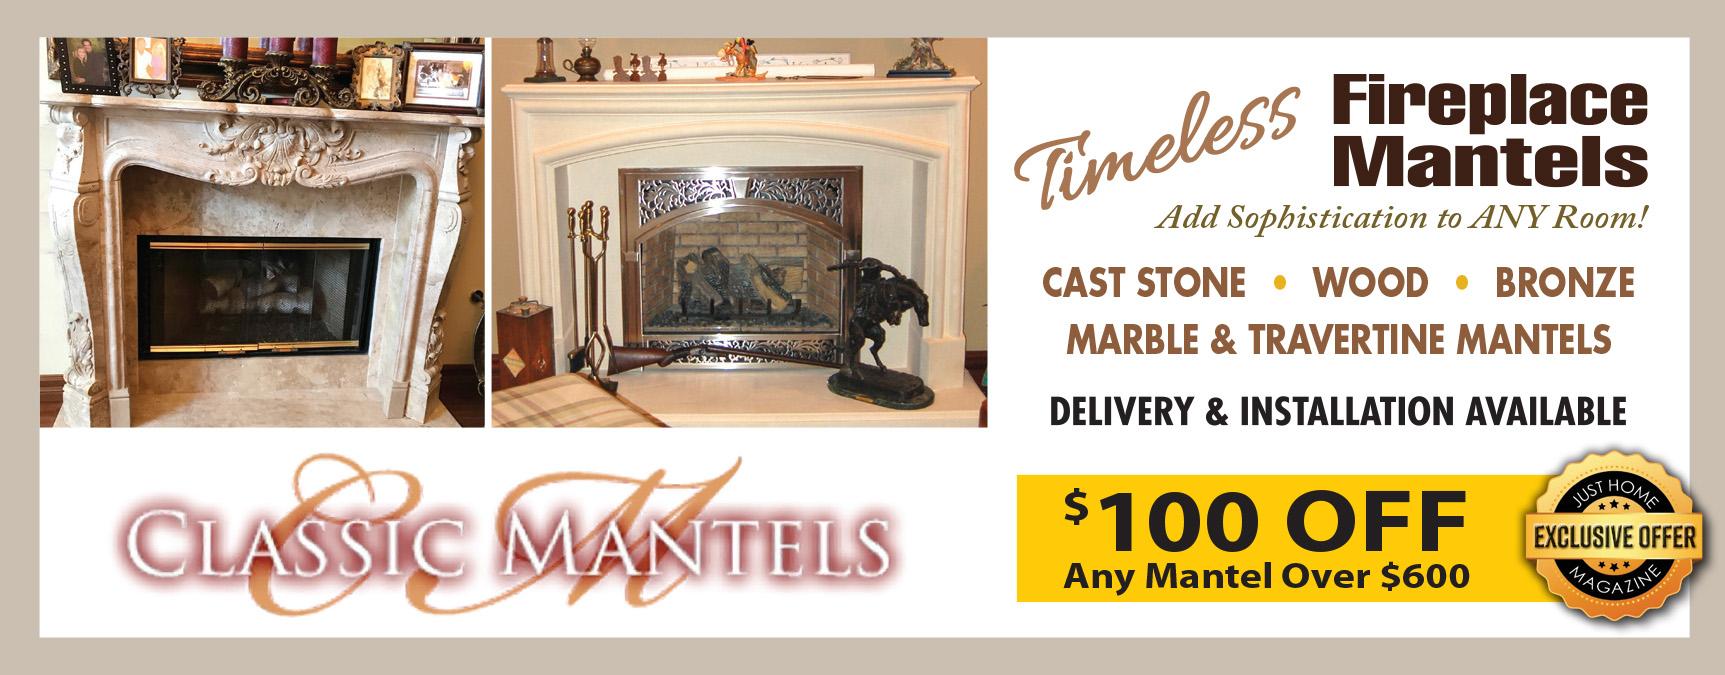 Classic Mantel_Offer_Reg-2_01-19.jpg